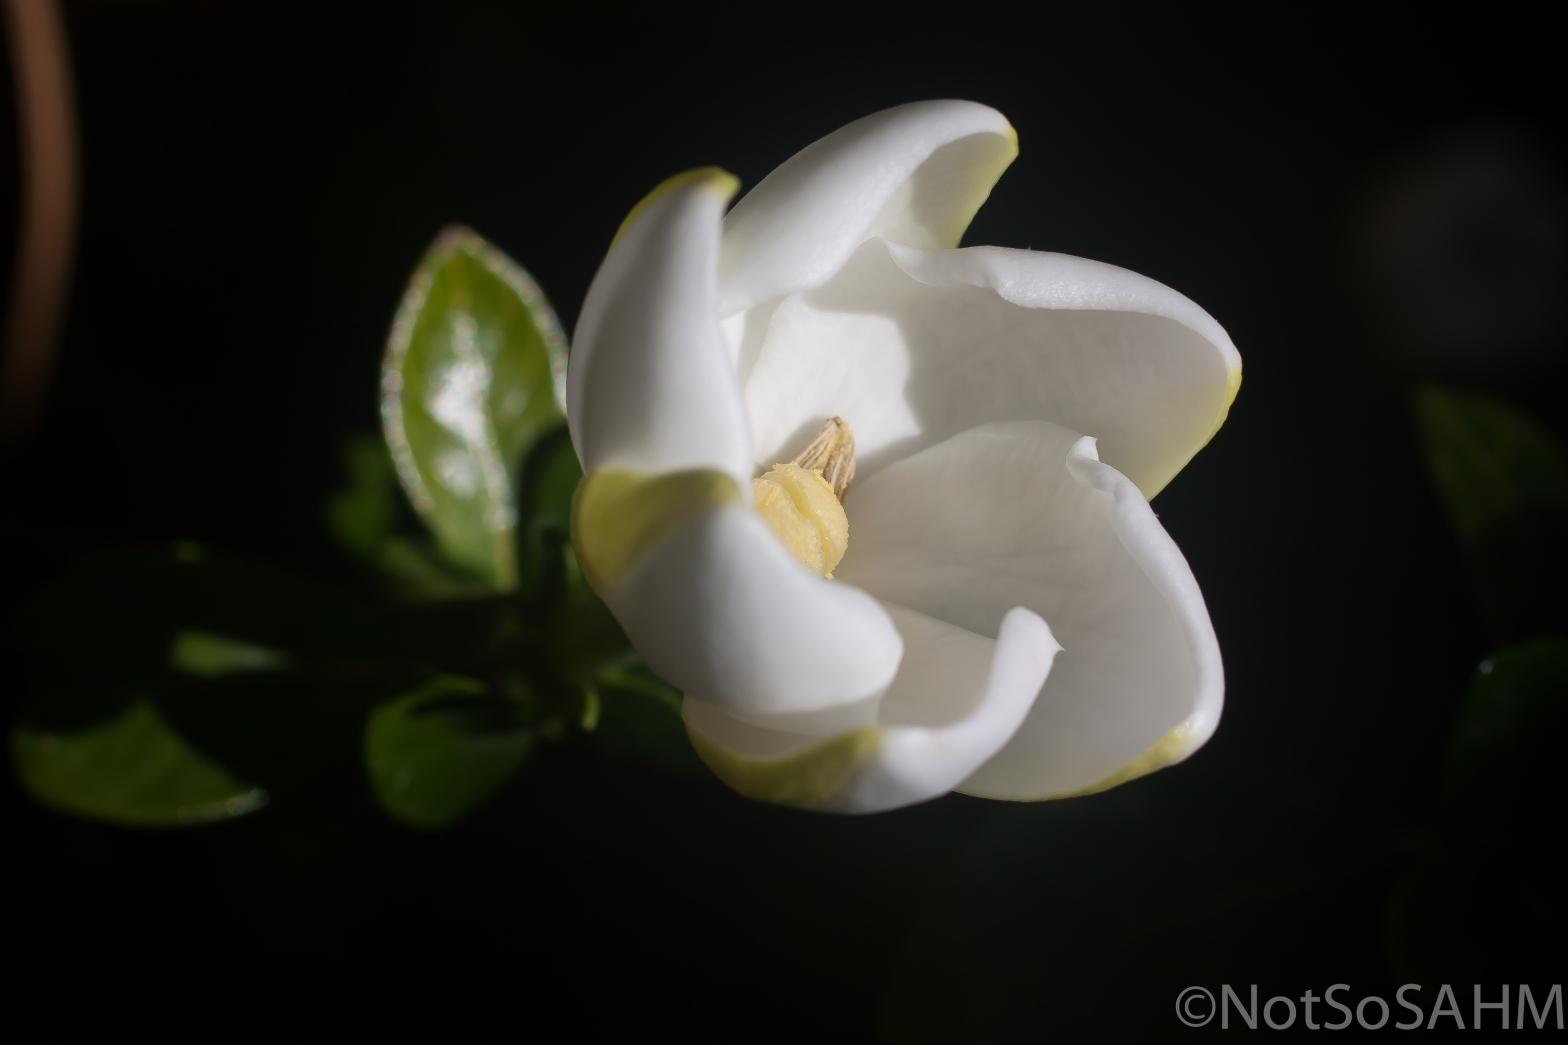 The petals of a gardenia unfurling